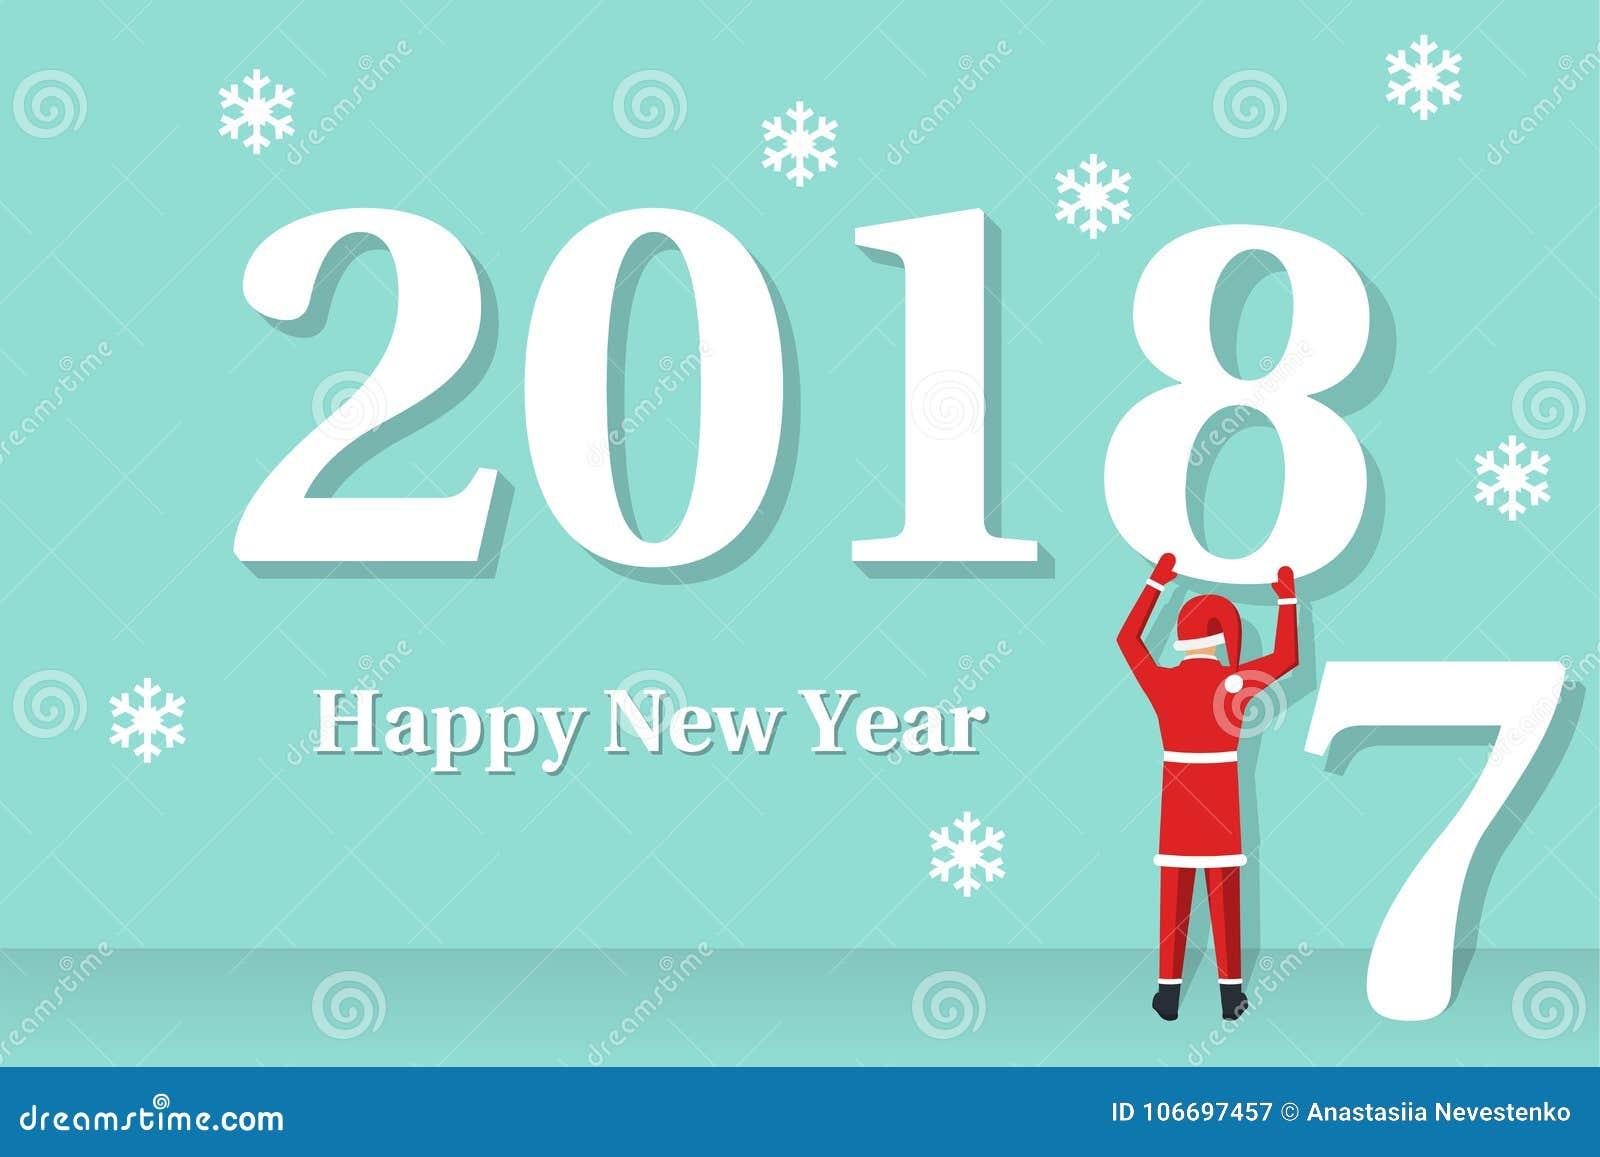 Happy New Year 2018 Santa Claus Stock Vector Illustration Of